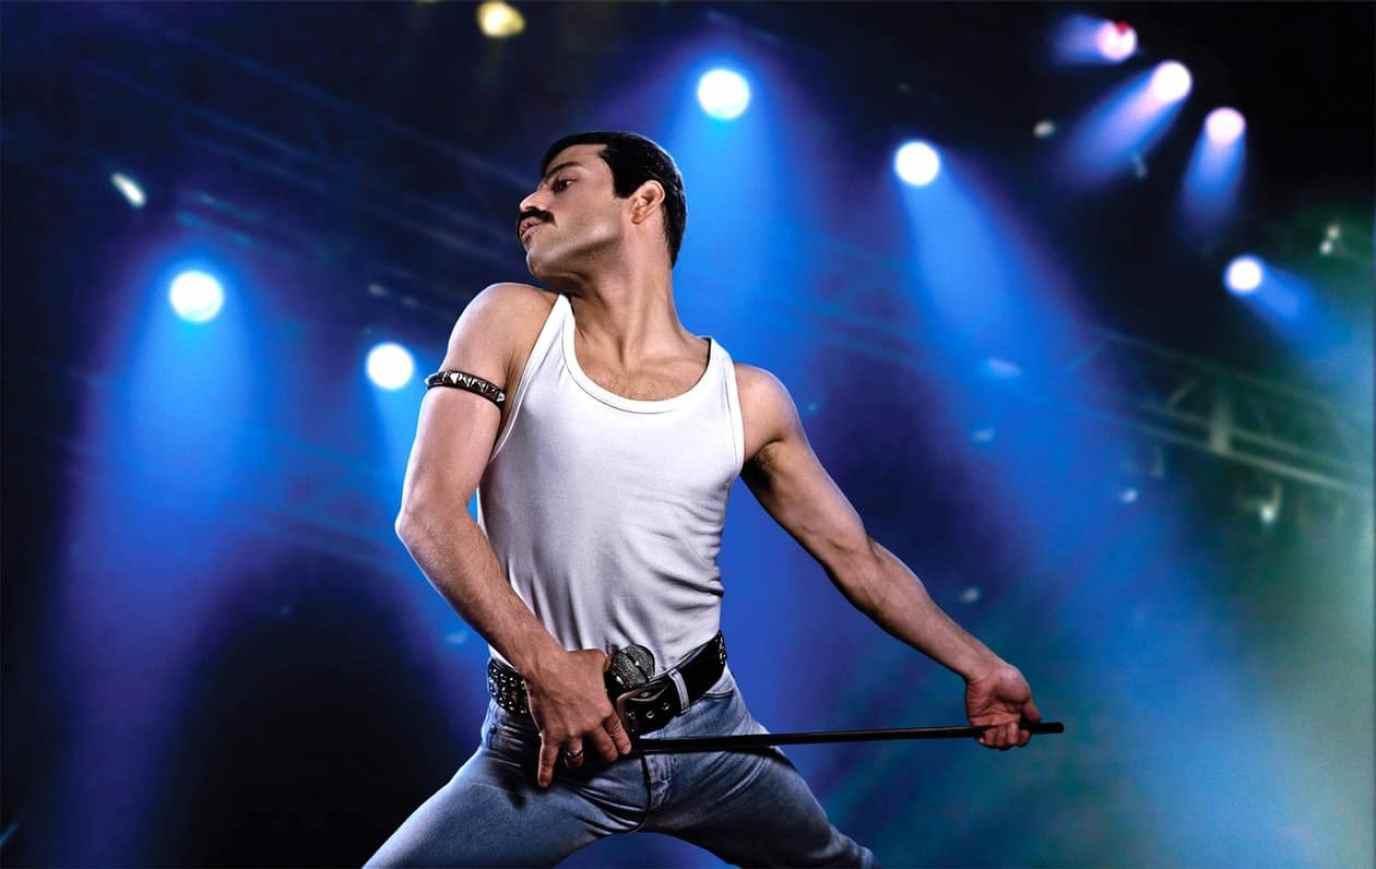 Rami Malek music biopic Bohemian Rhapsody Queen